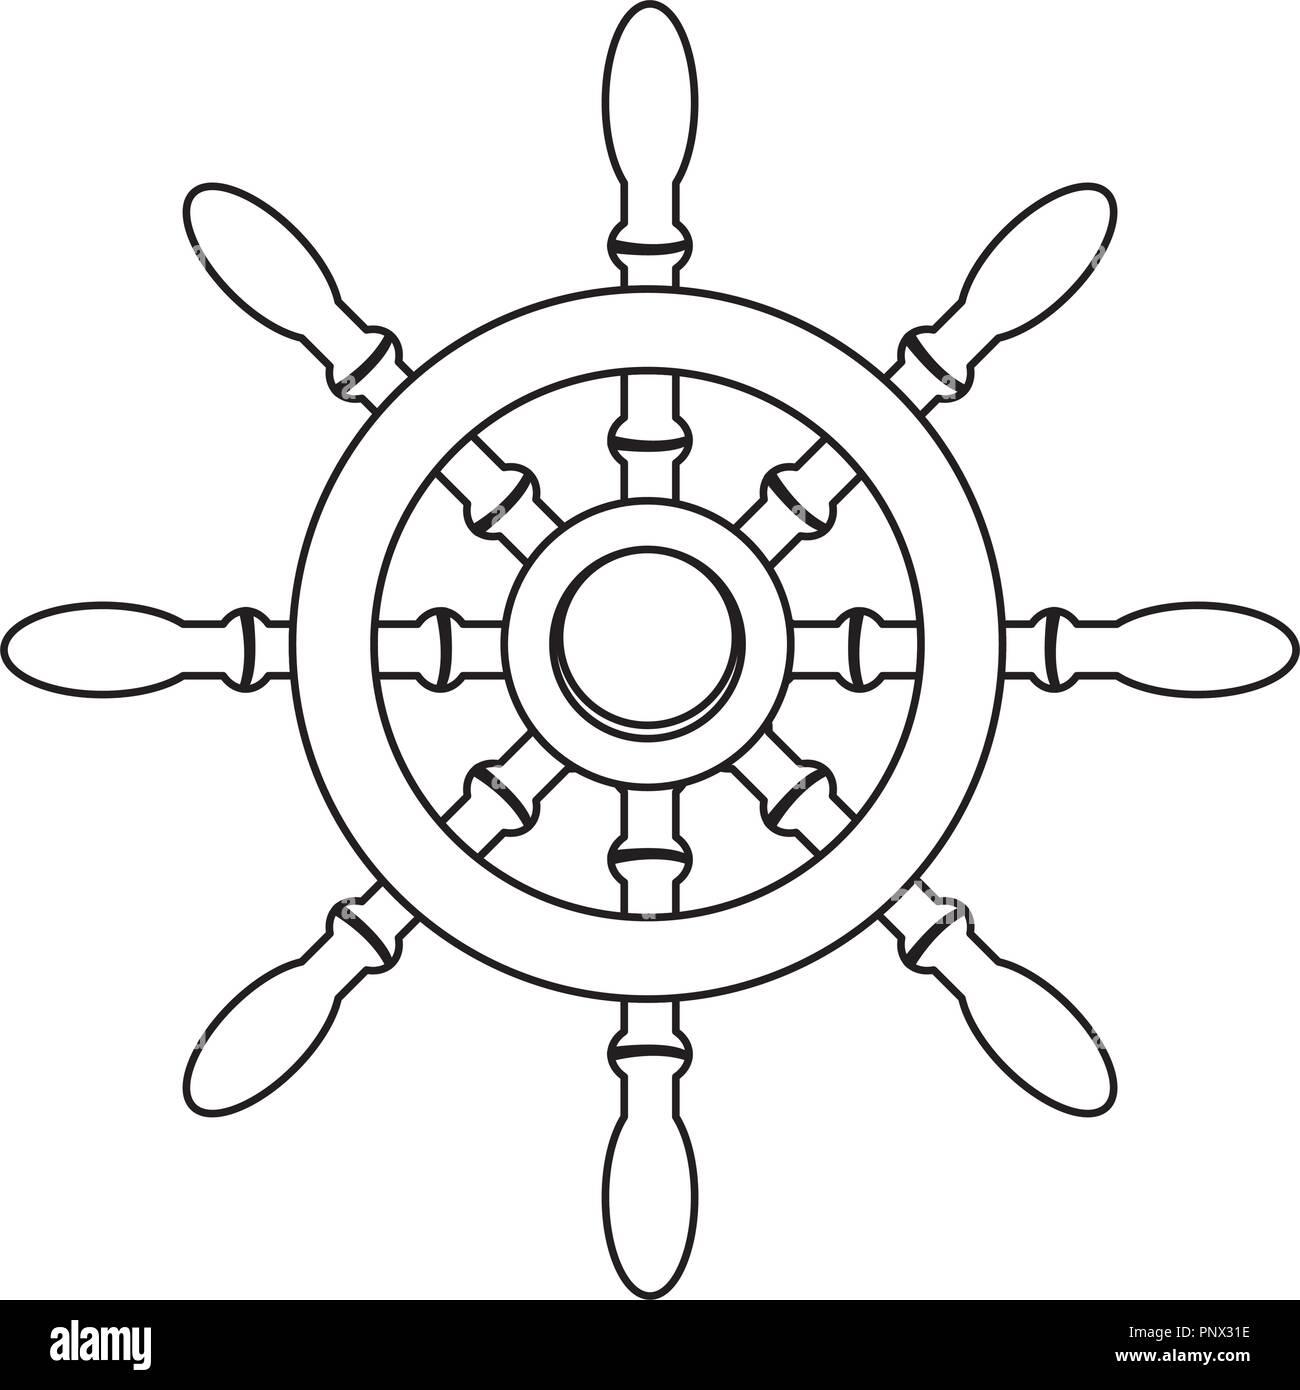 outline rudder ship object to marine navigation - Stock Image